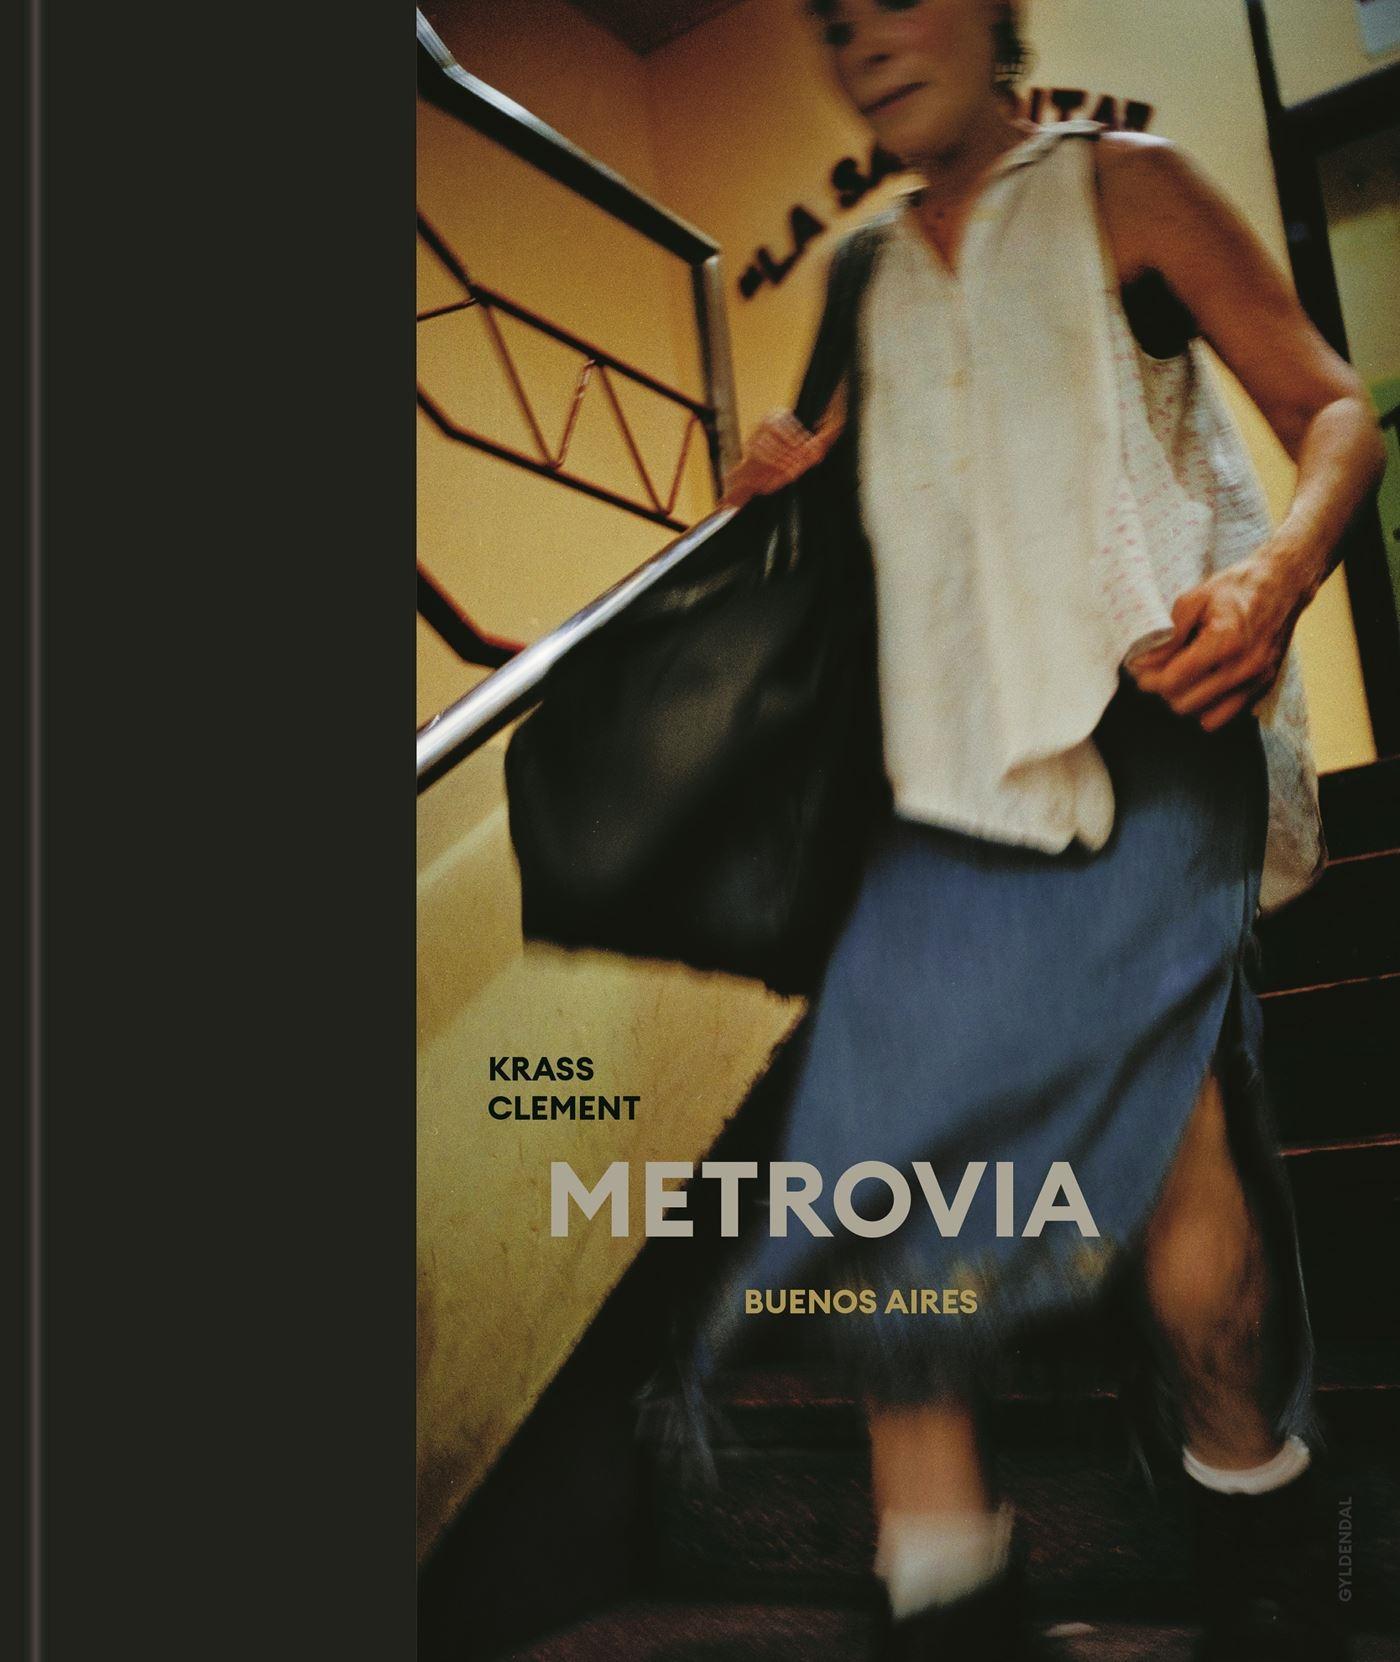 Clement, Krass. Metrovia